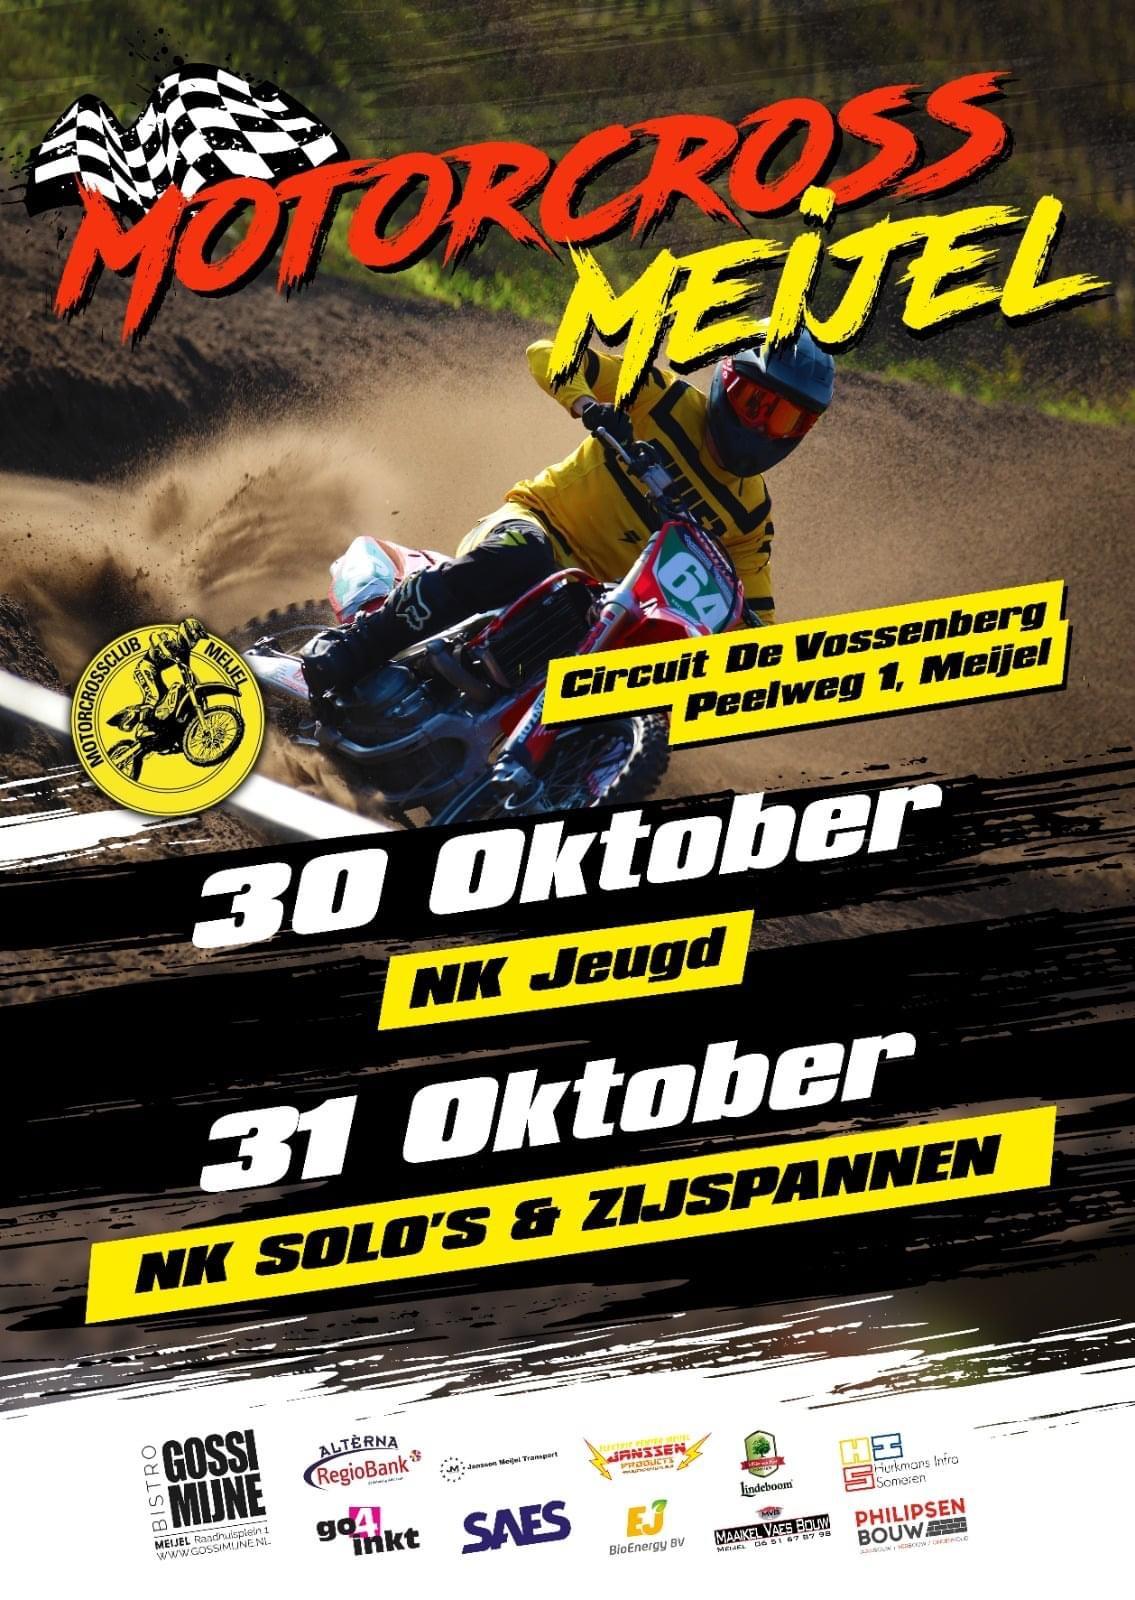 Meijel 31 ok - October 31, 2021